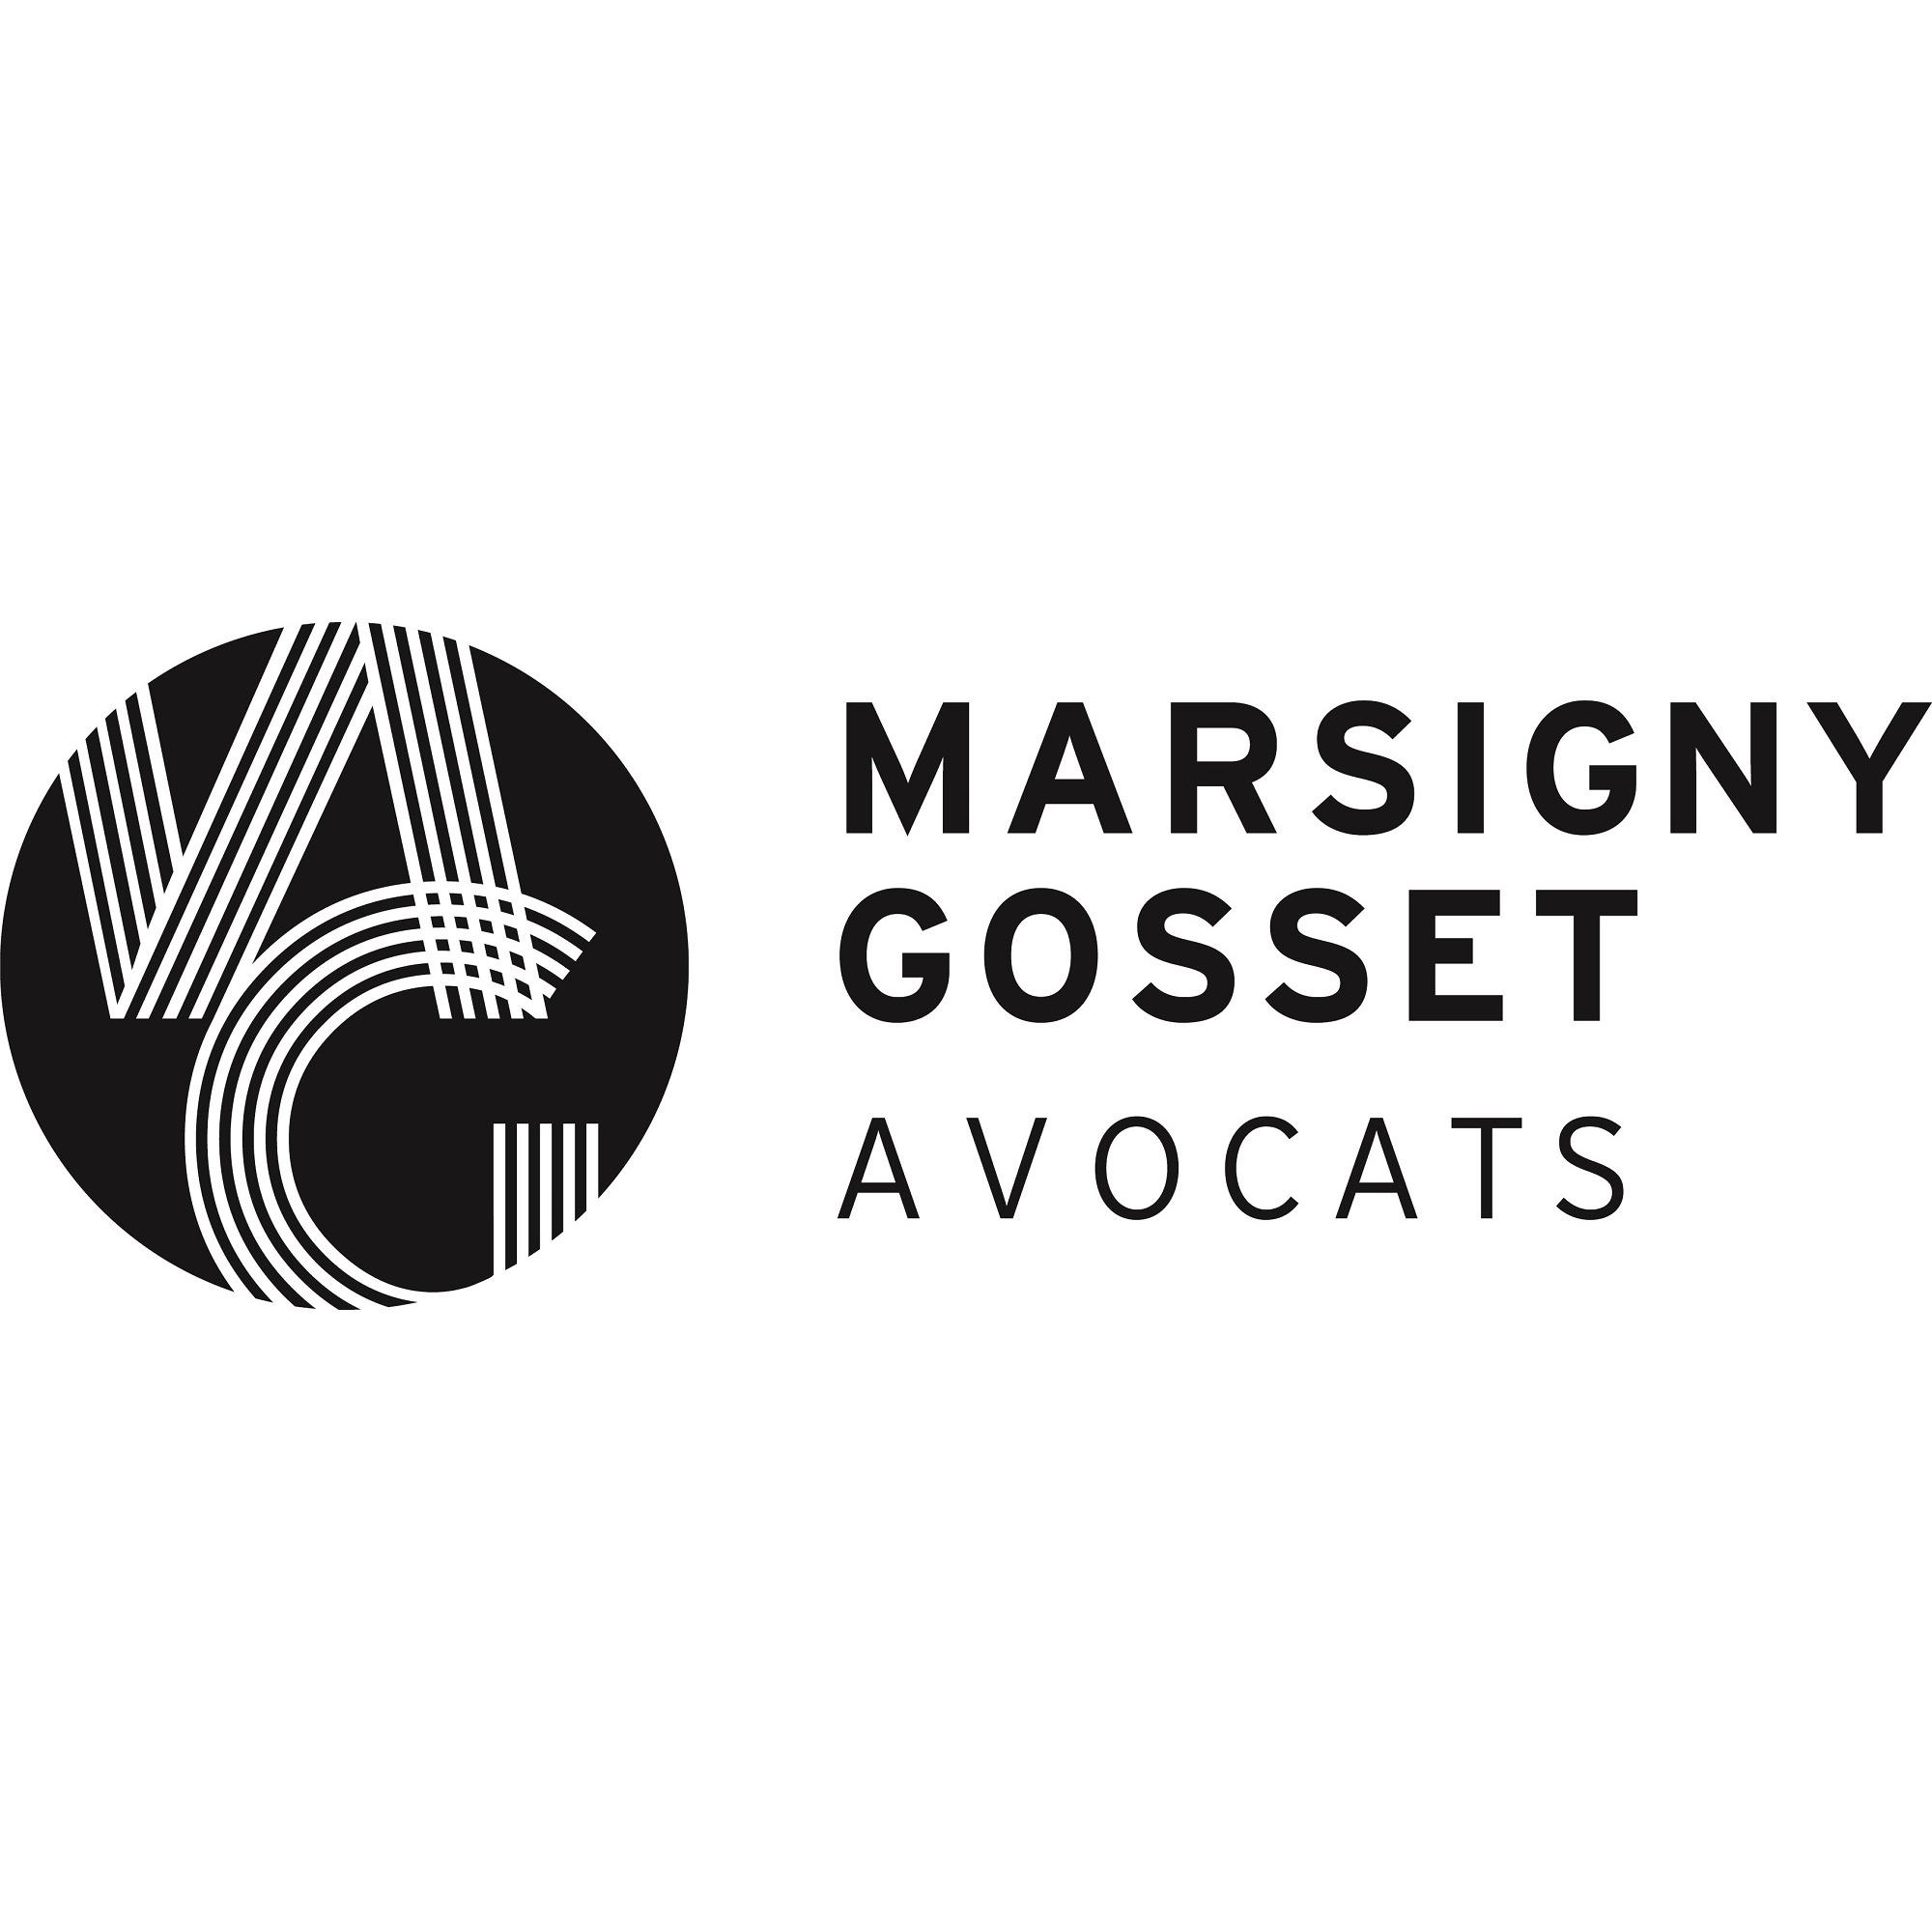 the Marsigny Gosset Avocats logo.